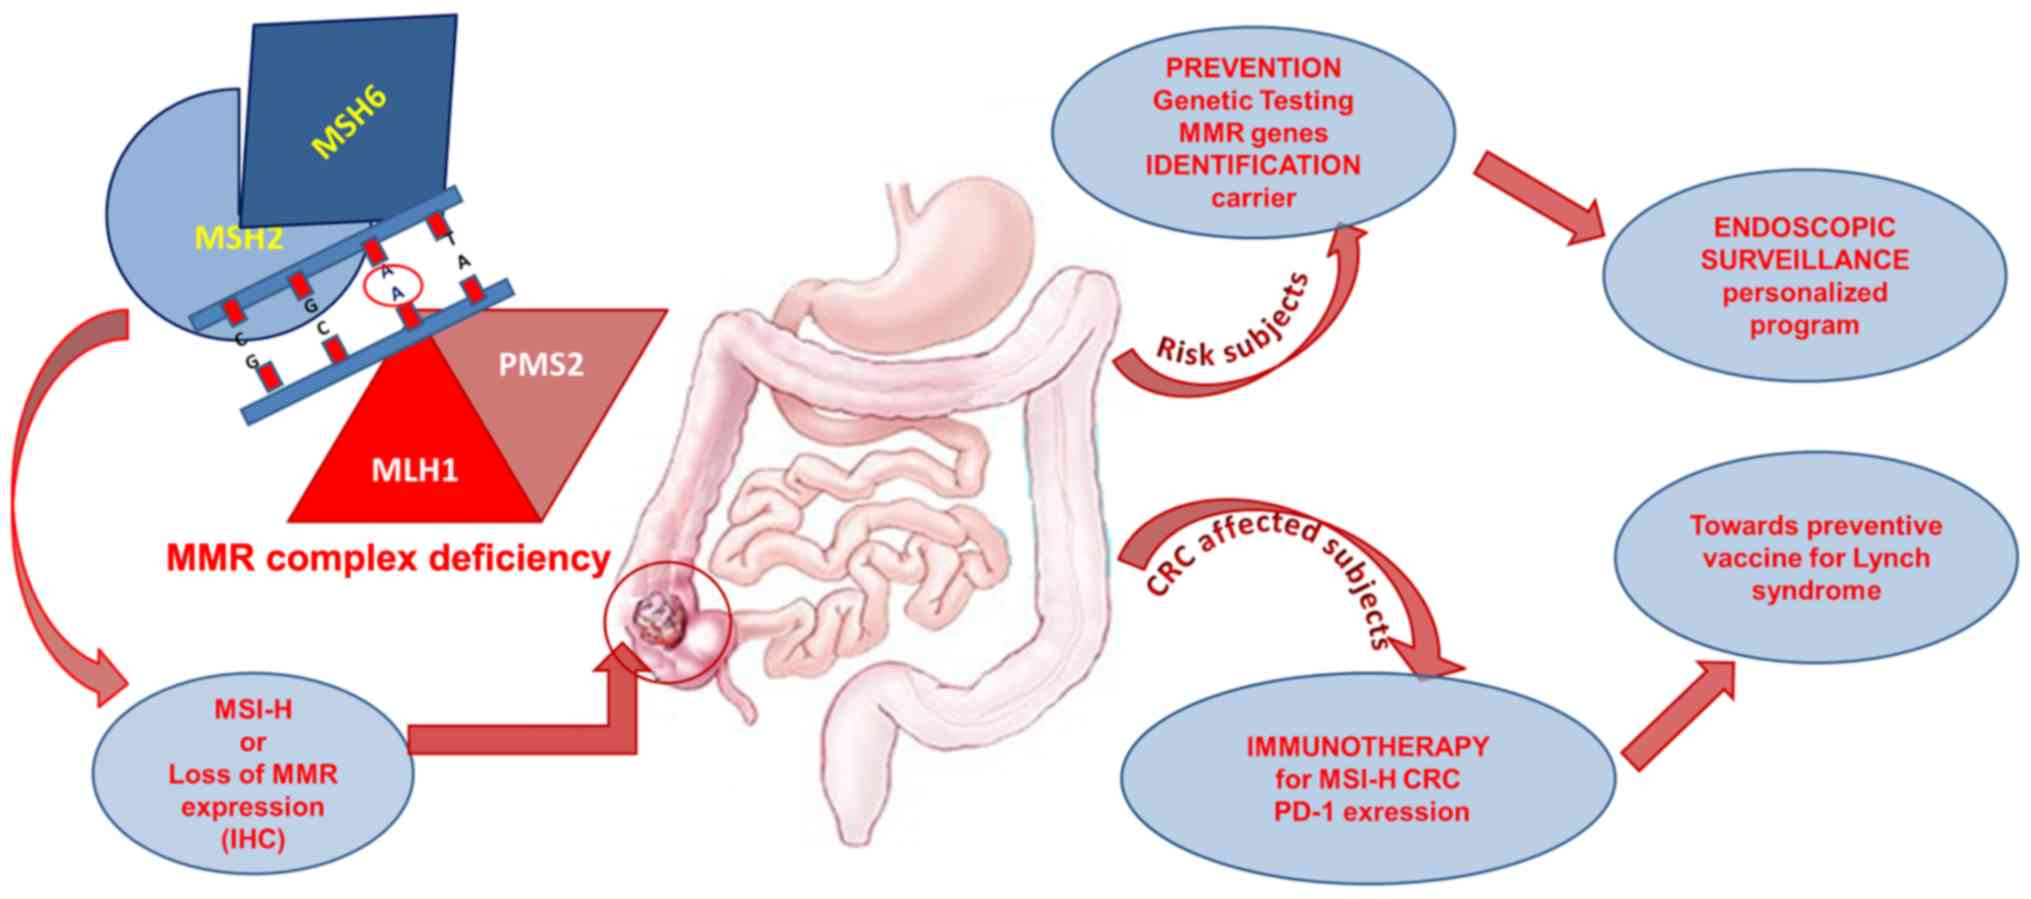 Hpv In Tongue Symptoms Squamous Papilloma Tongue Symptoms Traducerea Papilloma In 25 De Limbi